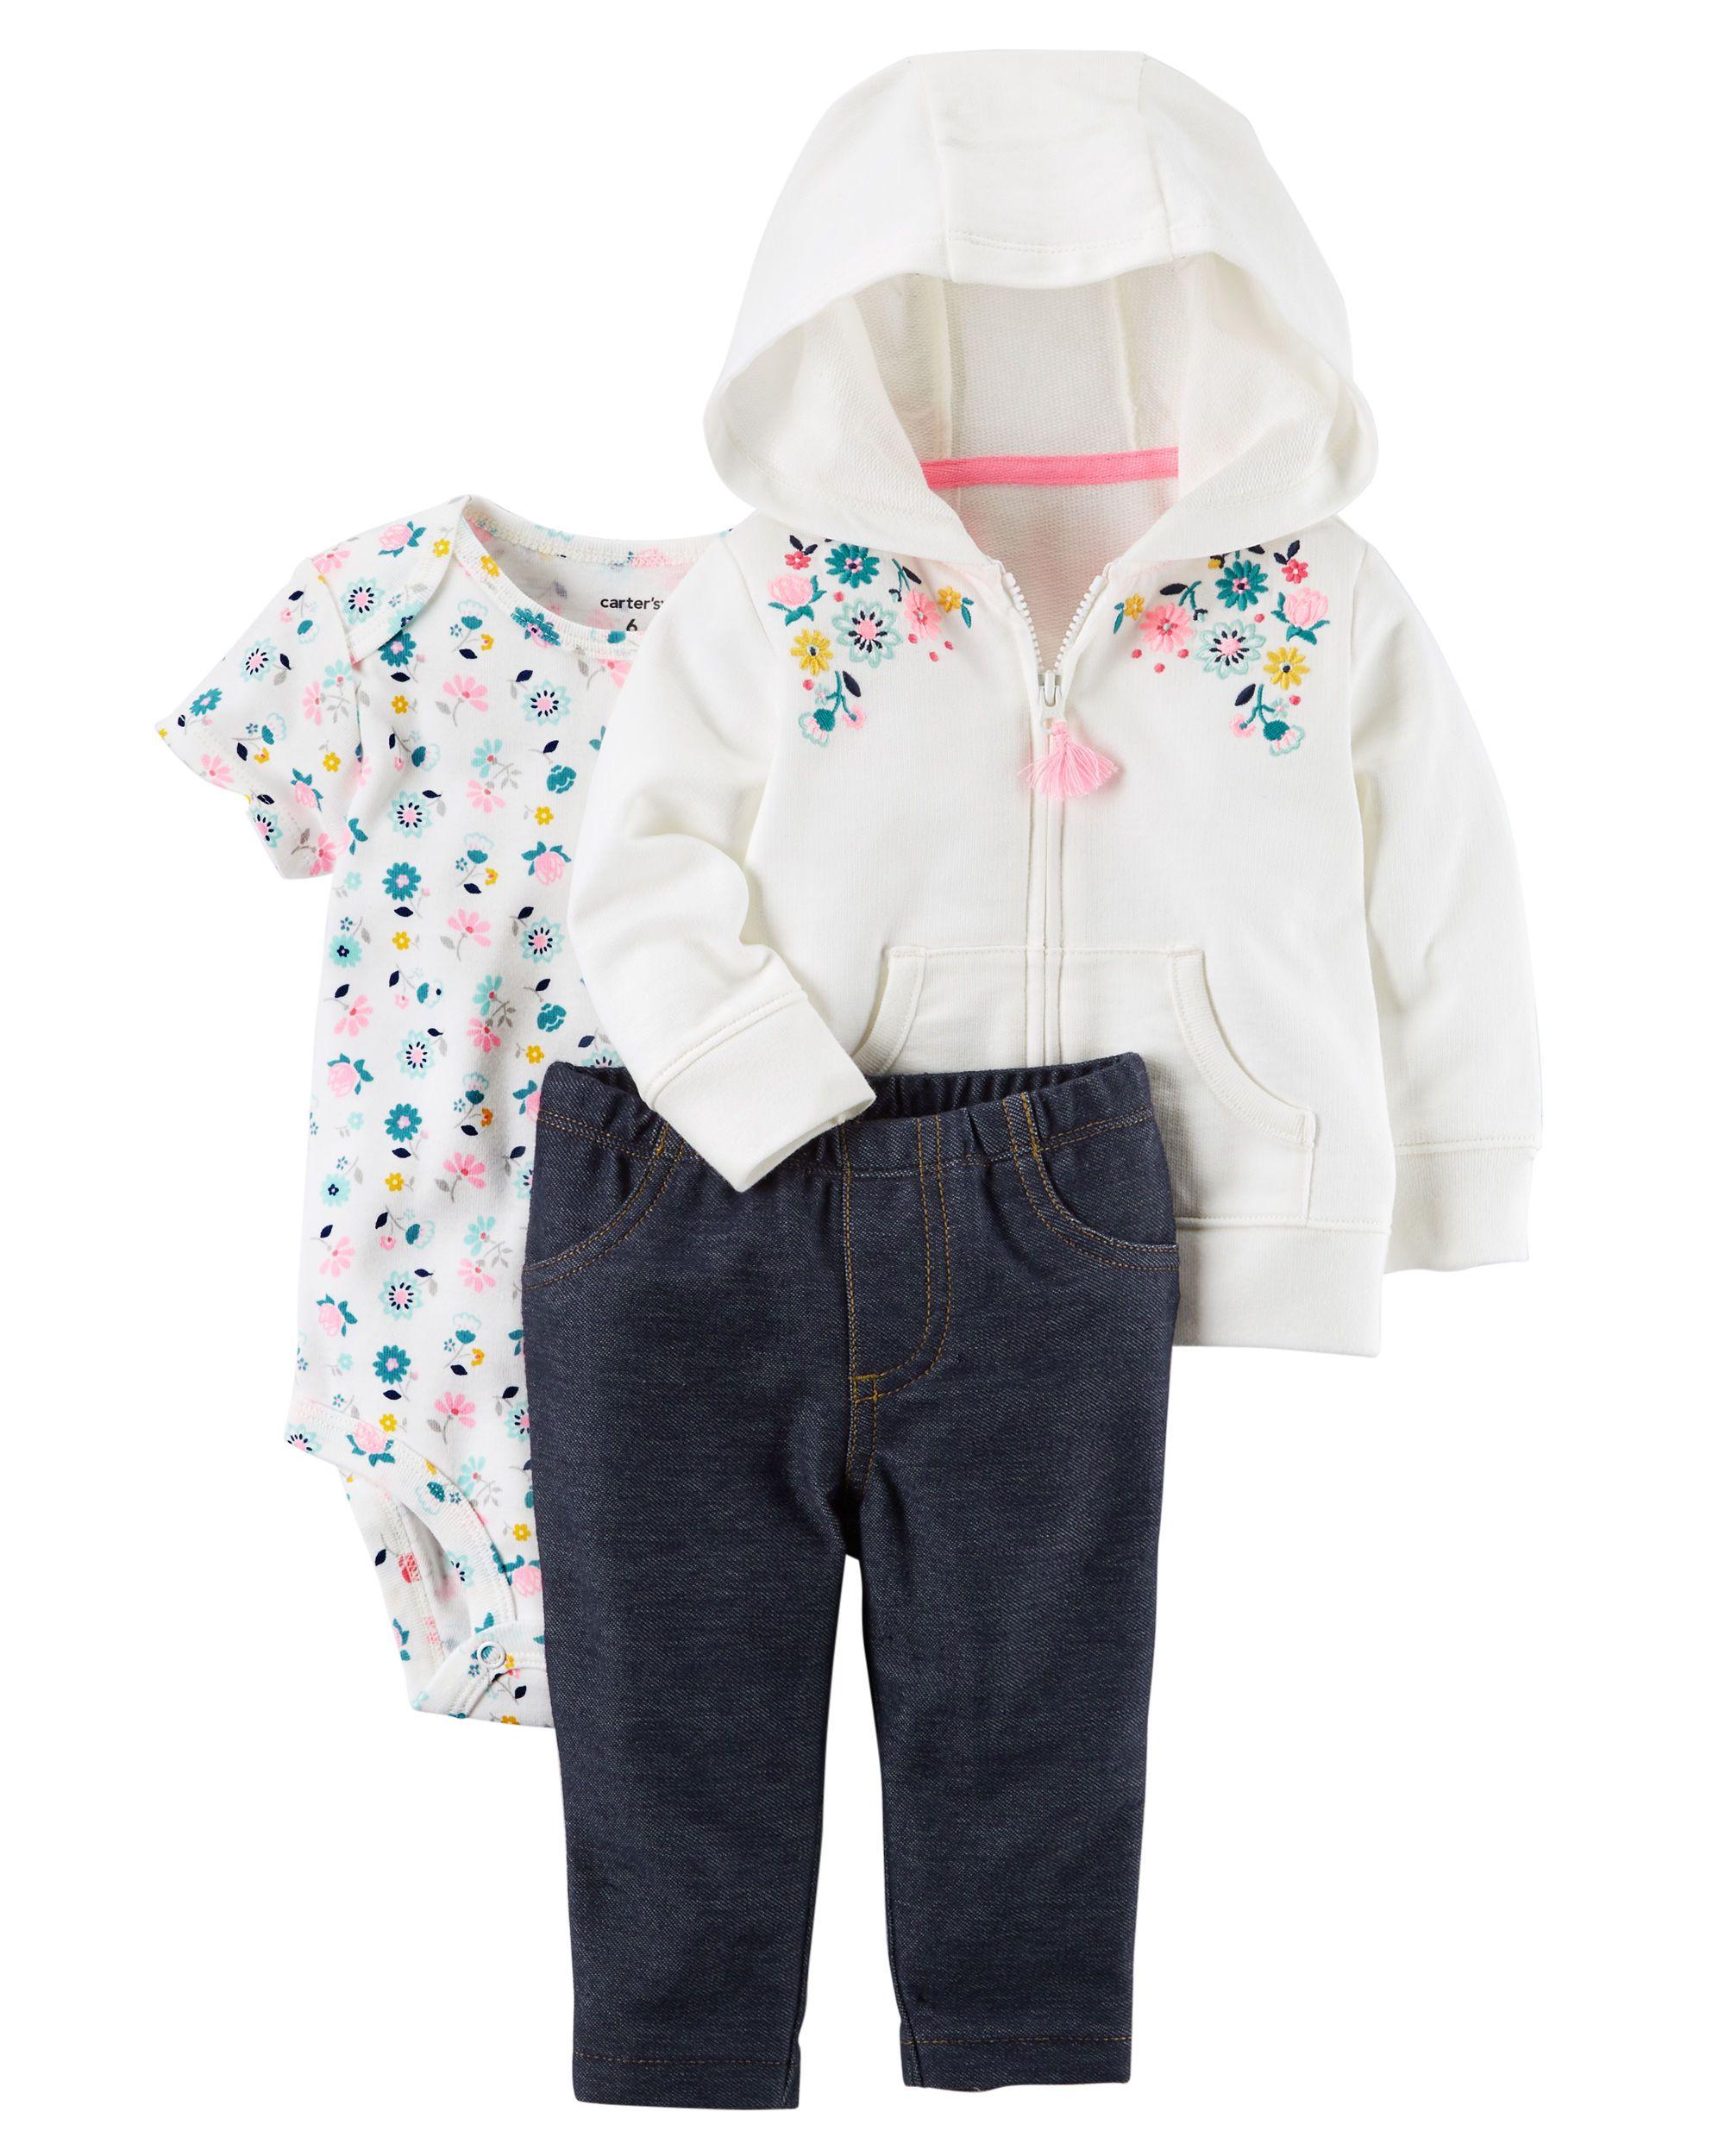 Pilot Girl Cotton Crewneck Boys-Girls Infant Sleepwear Pajama 2 Pcs Set